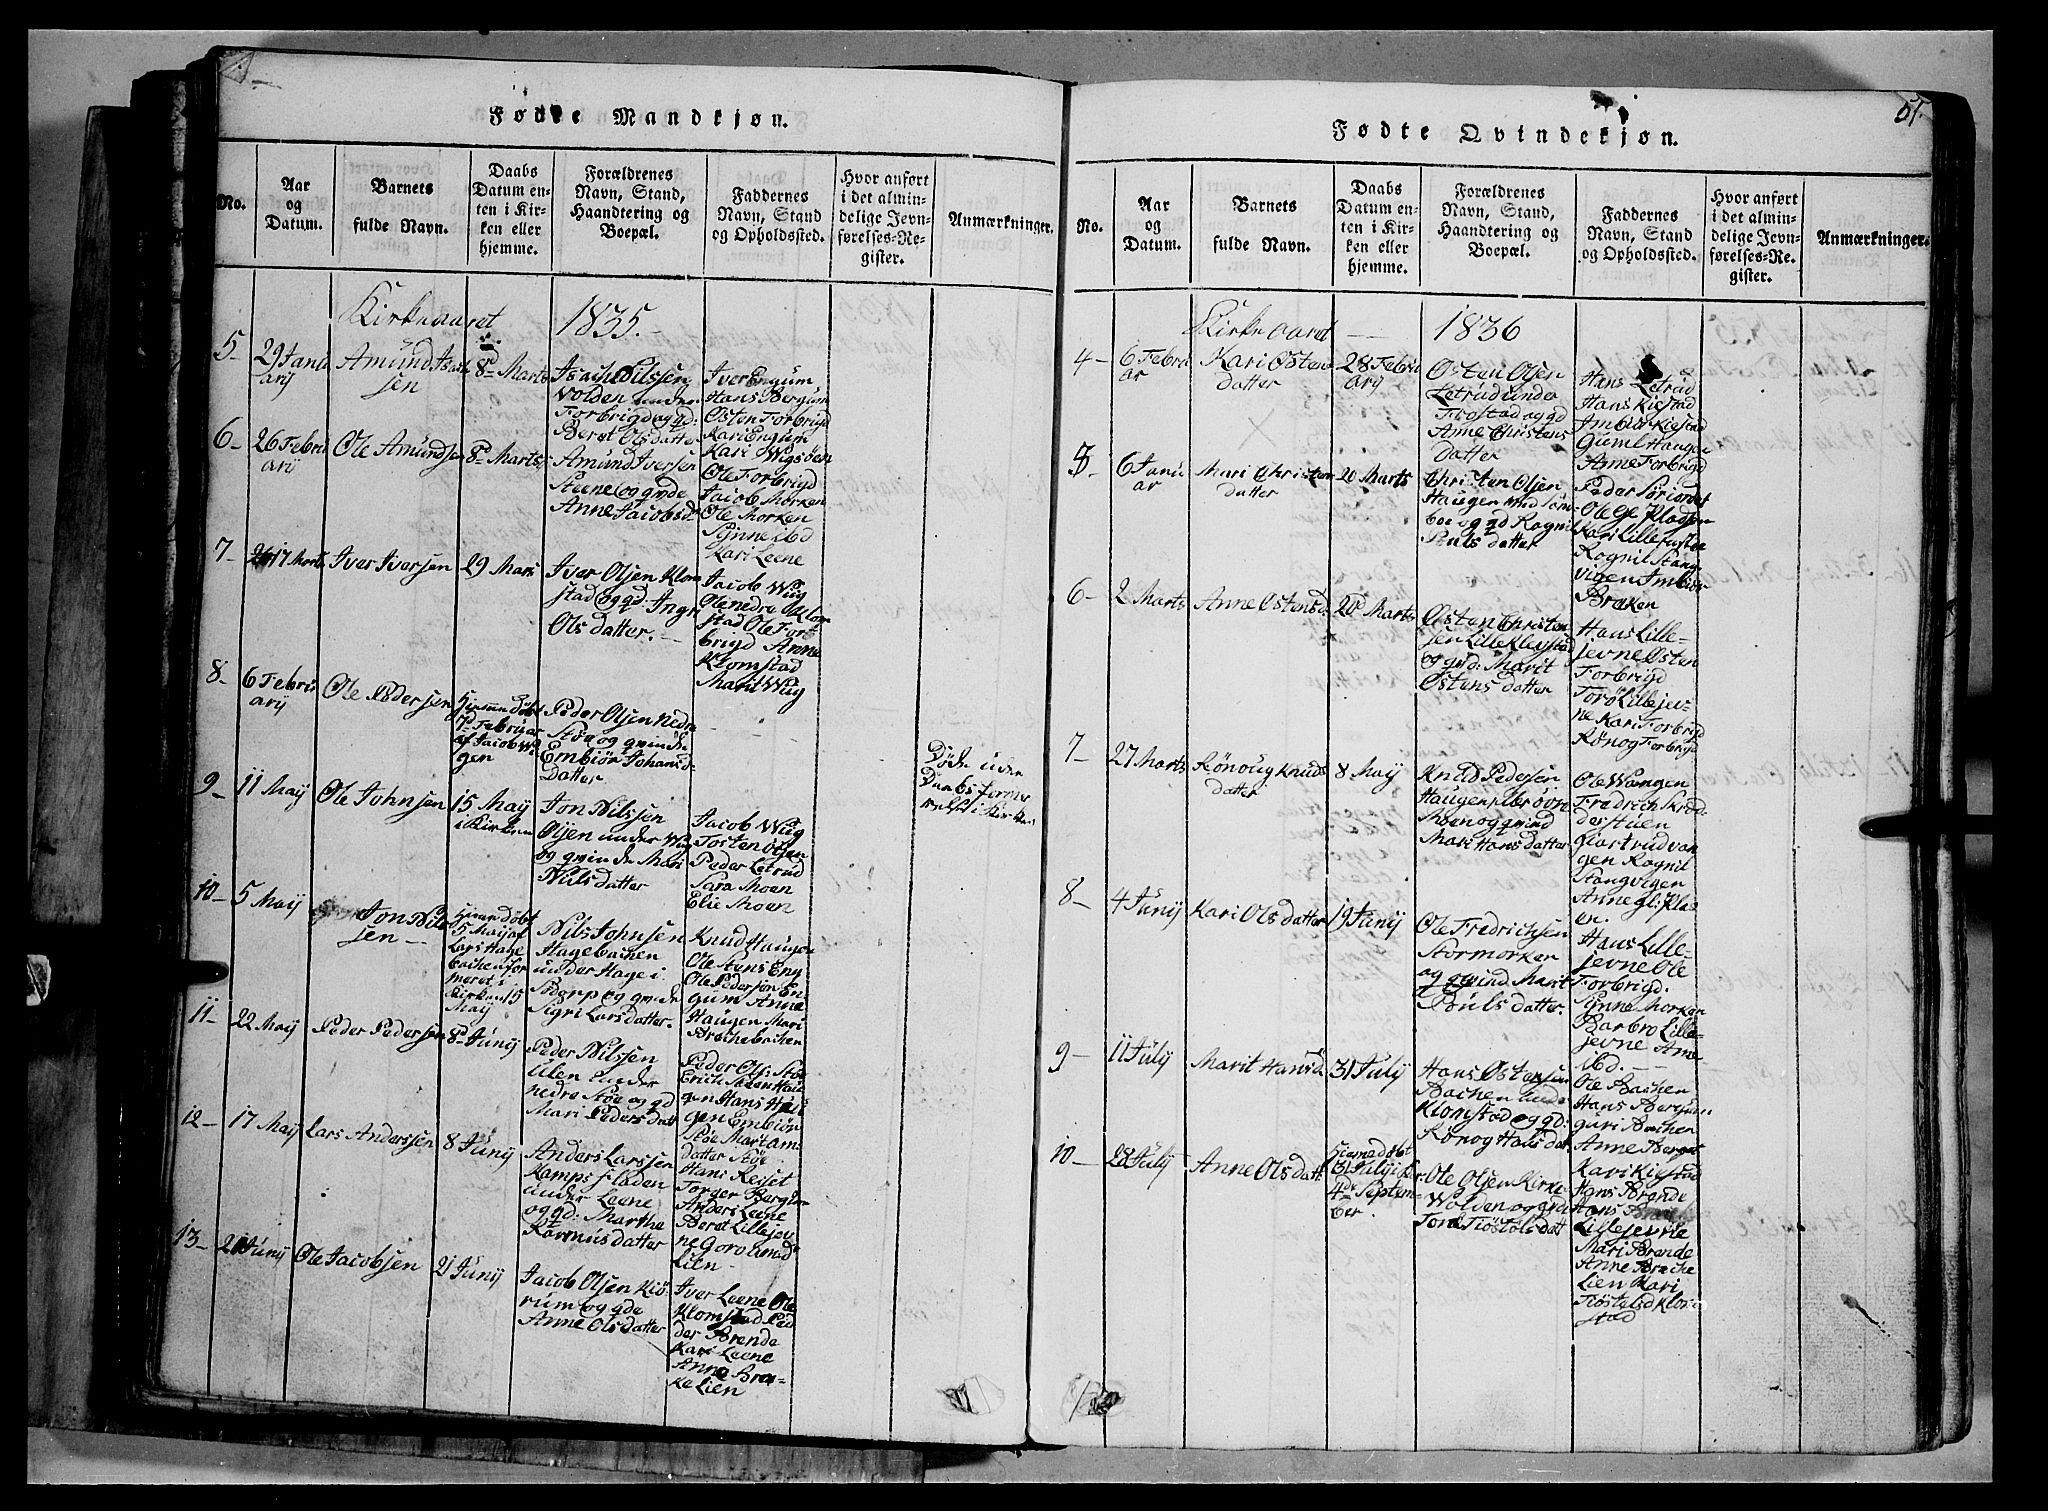 SAH, Fron prestekontor, H/Ha/Hab/L0002: Klokkerbok nr. 2, 1816-1850, s. 51